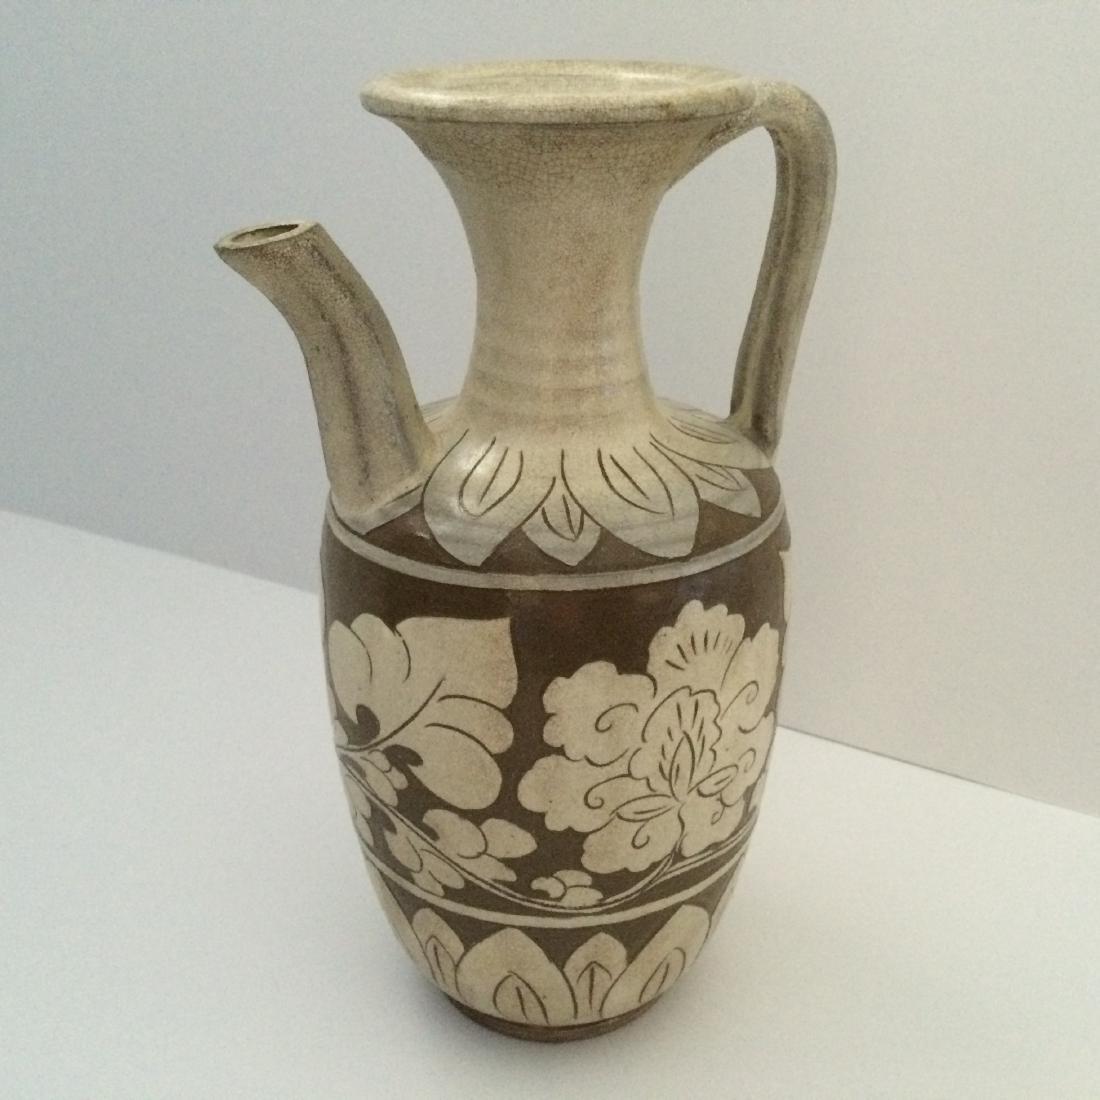 "Chinese Liao Dynasty Ceramic Ci Zhou Ware Pitcher 10""H"